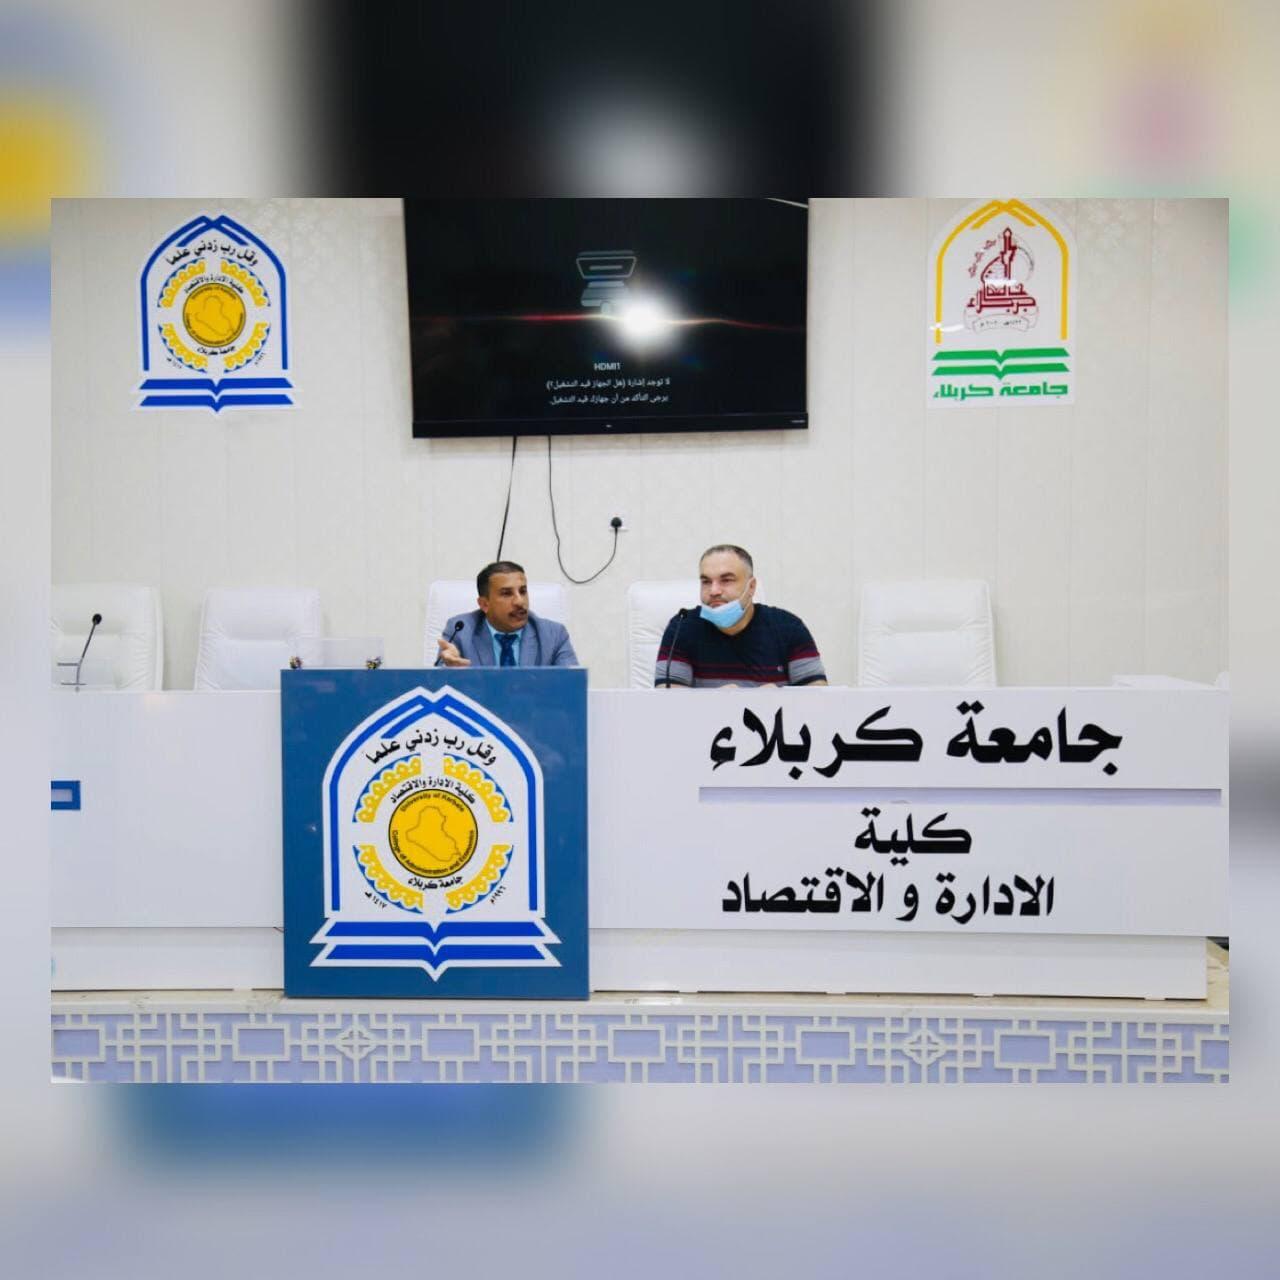 You are currently viewing جامعة كربلاء تنظم برنامج تدريبي عن تطوير القدرات المالية والادارية لموظفي الدولة